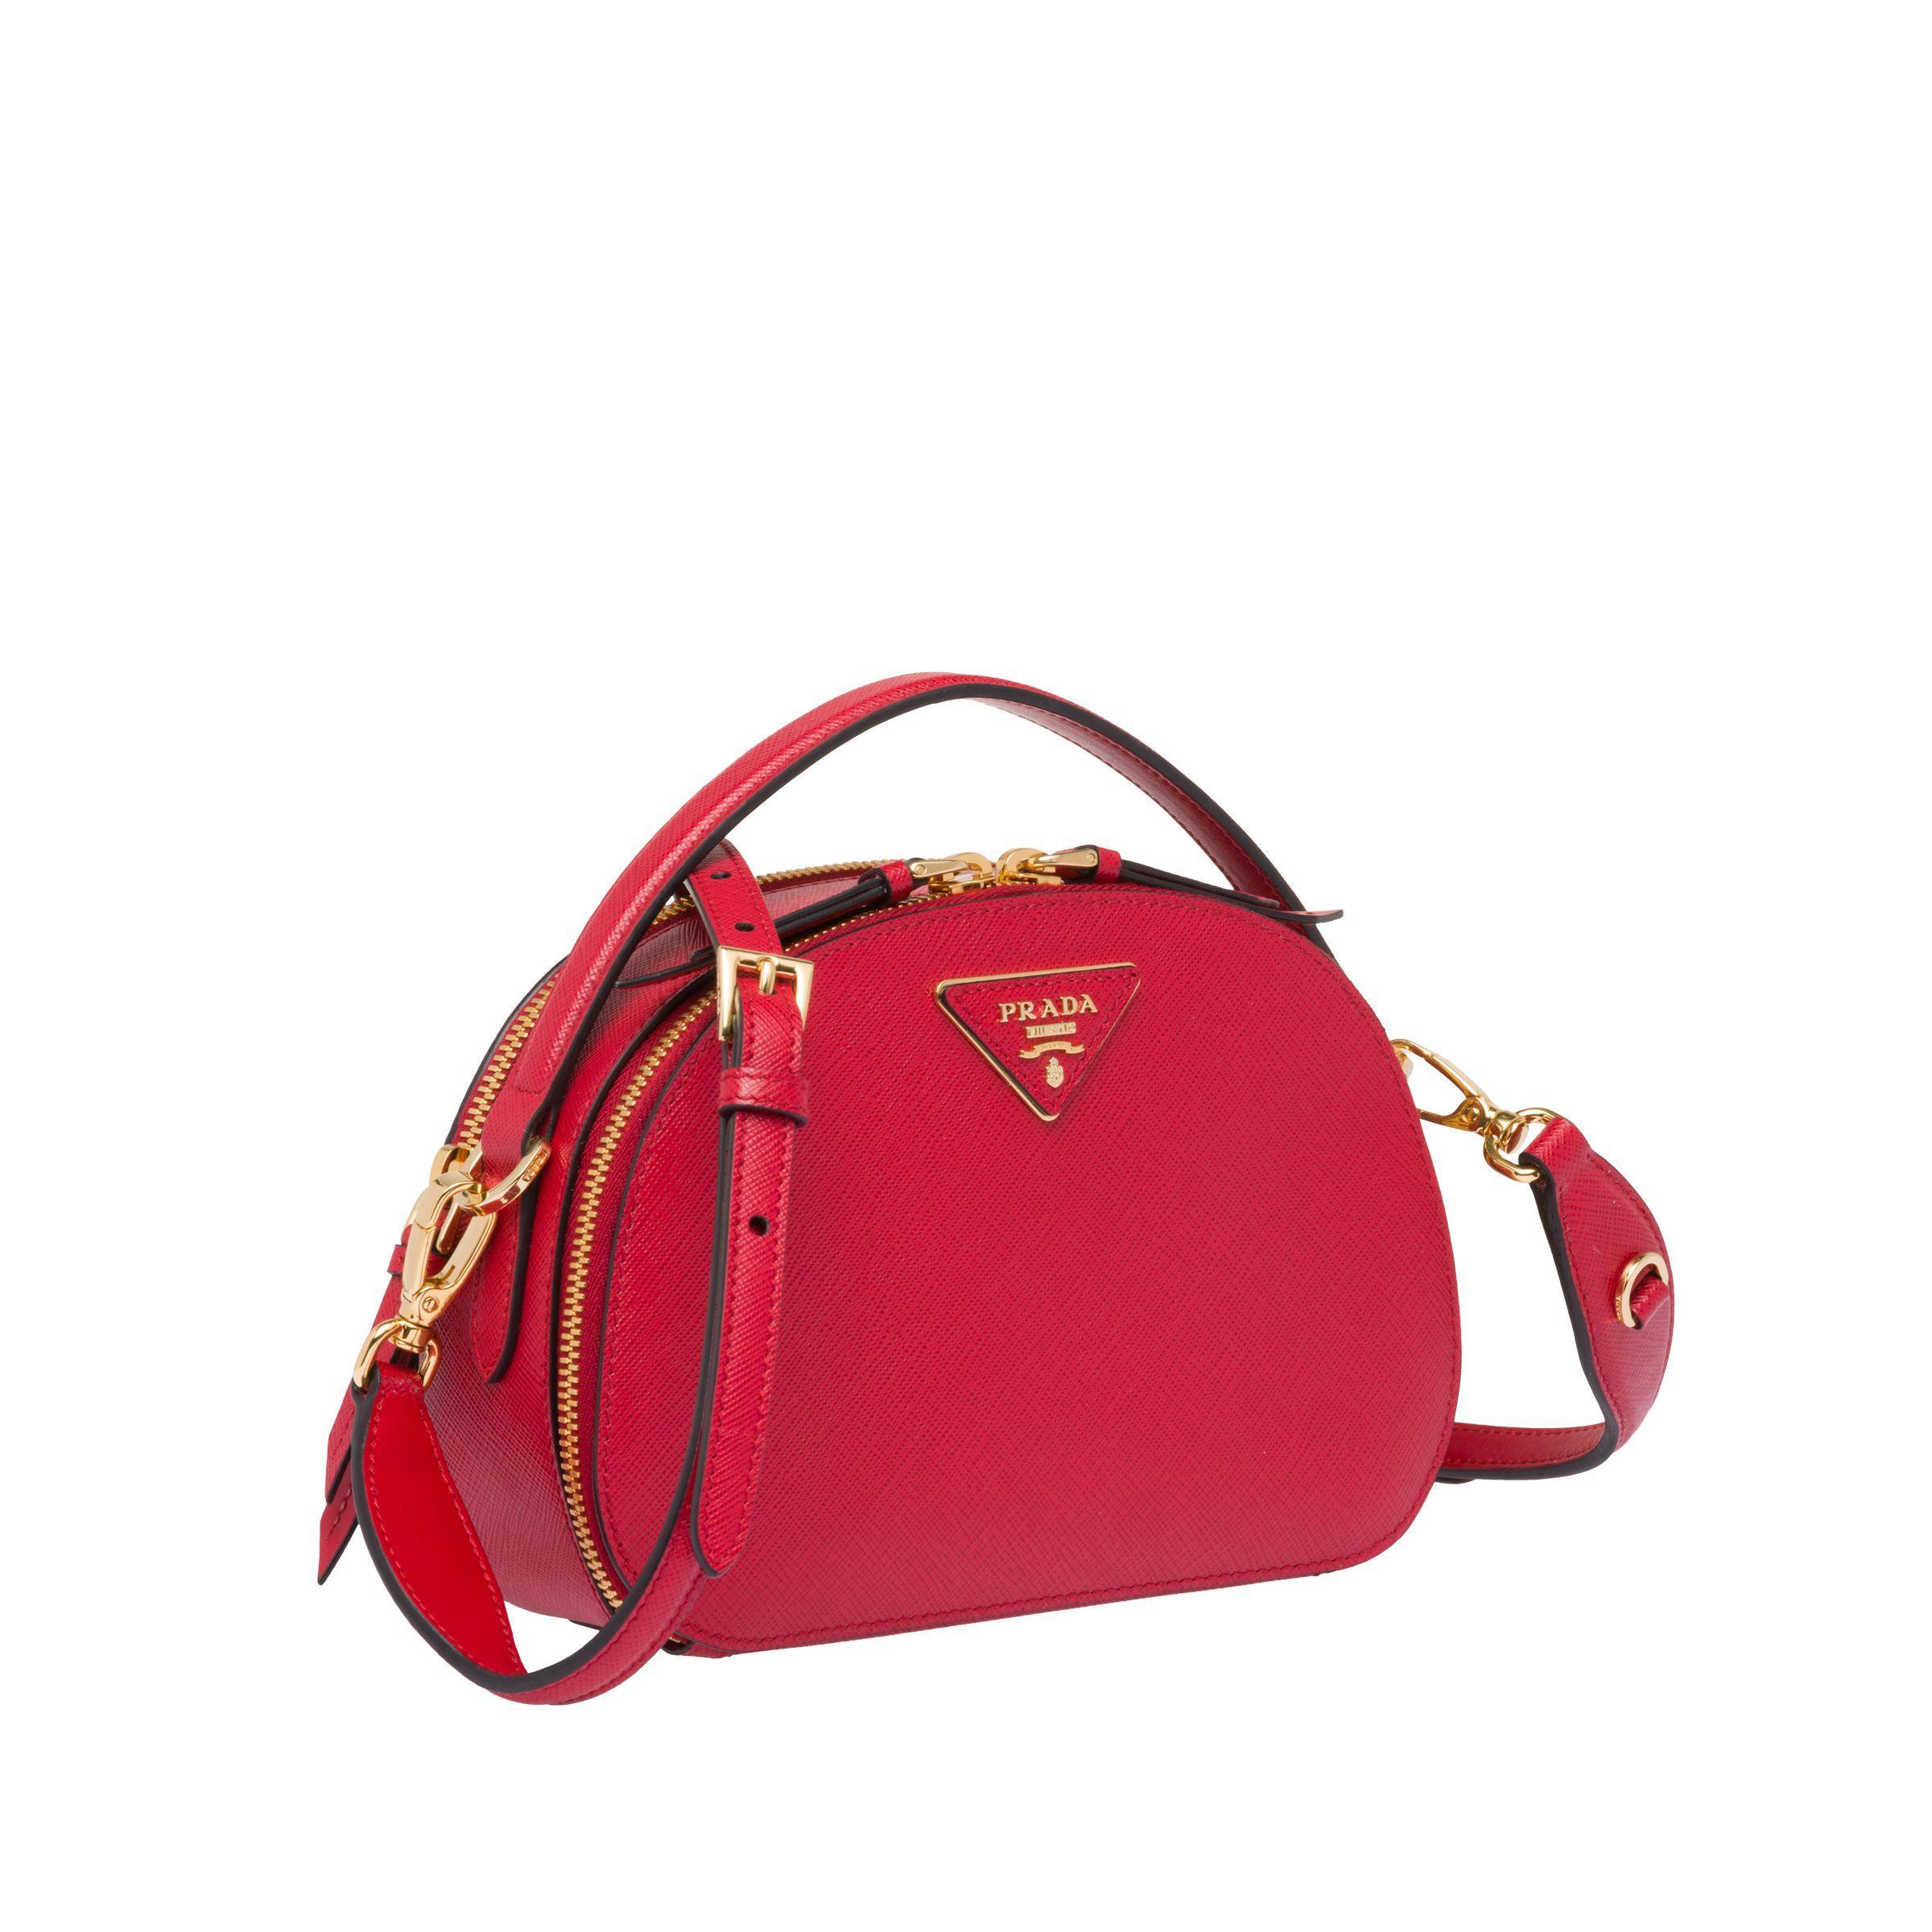 14fd866c7698d1 Prada - Red Odette Saffiano Leather Bag - Lyst. View fullscreen